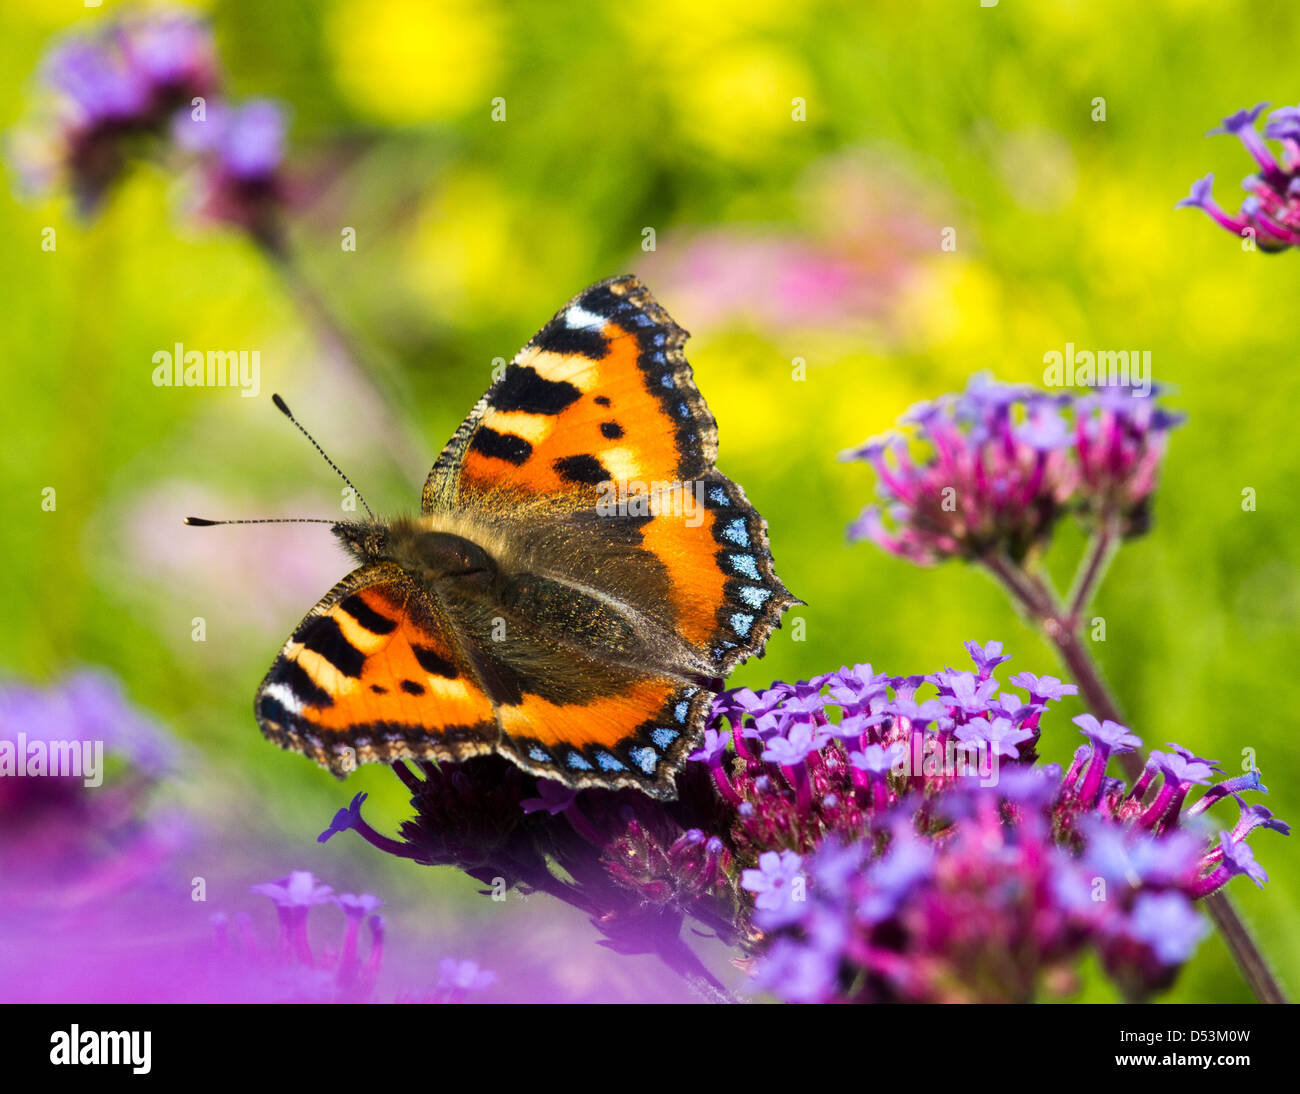 Small Tortoiseshell butterfly, Summer 2012 - Stock Image